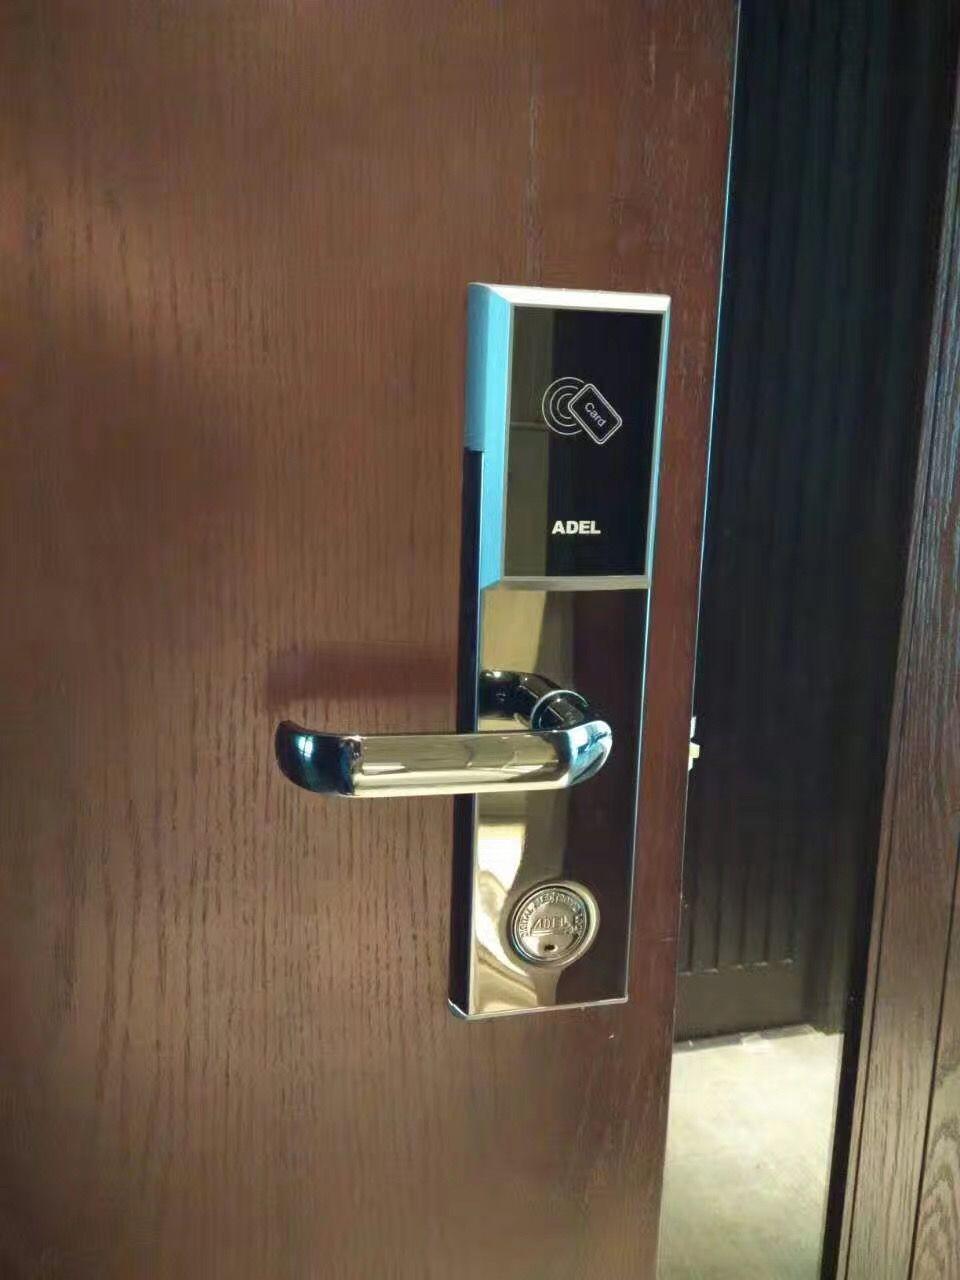 Adel No 11 Mifare Hotel Lock Specialized In Hotel Door Lock Manufacture Hotel Door Locks Hotel Lock Hotel Door